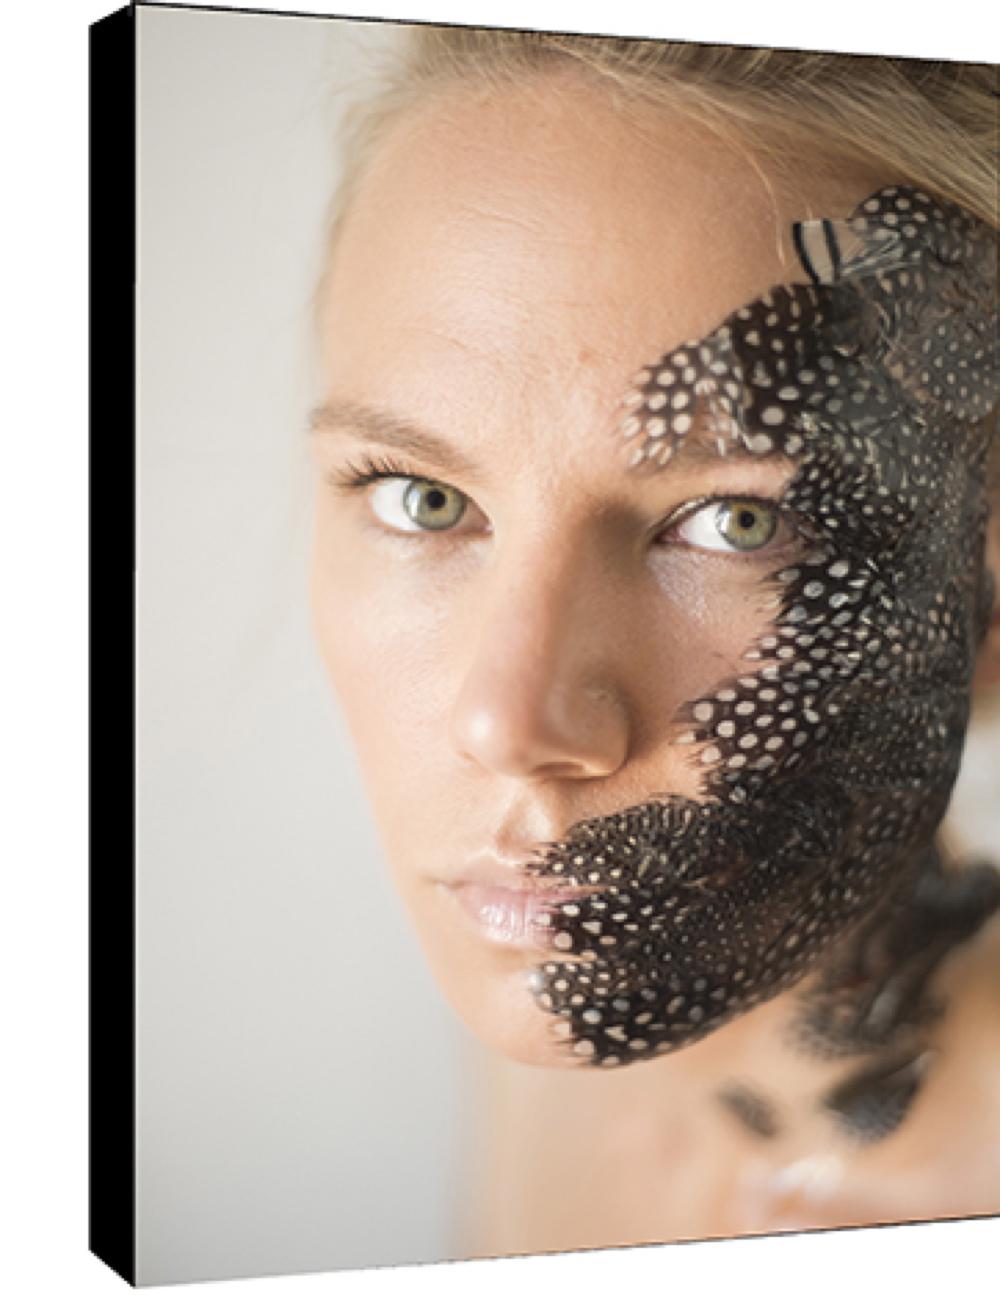 la pintade,  par la photographe Sylwia Bernat,  Dim: 50 cm x 70 cm